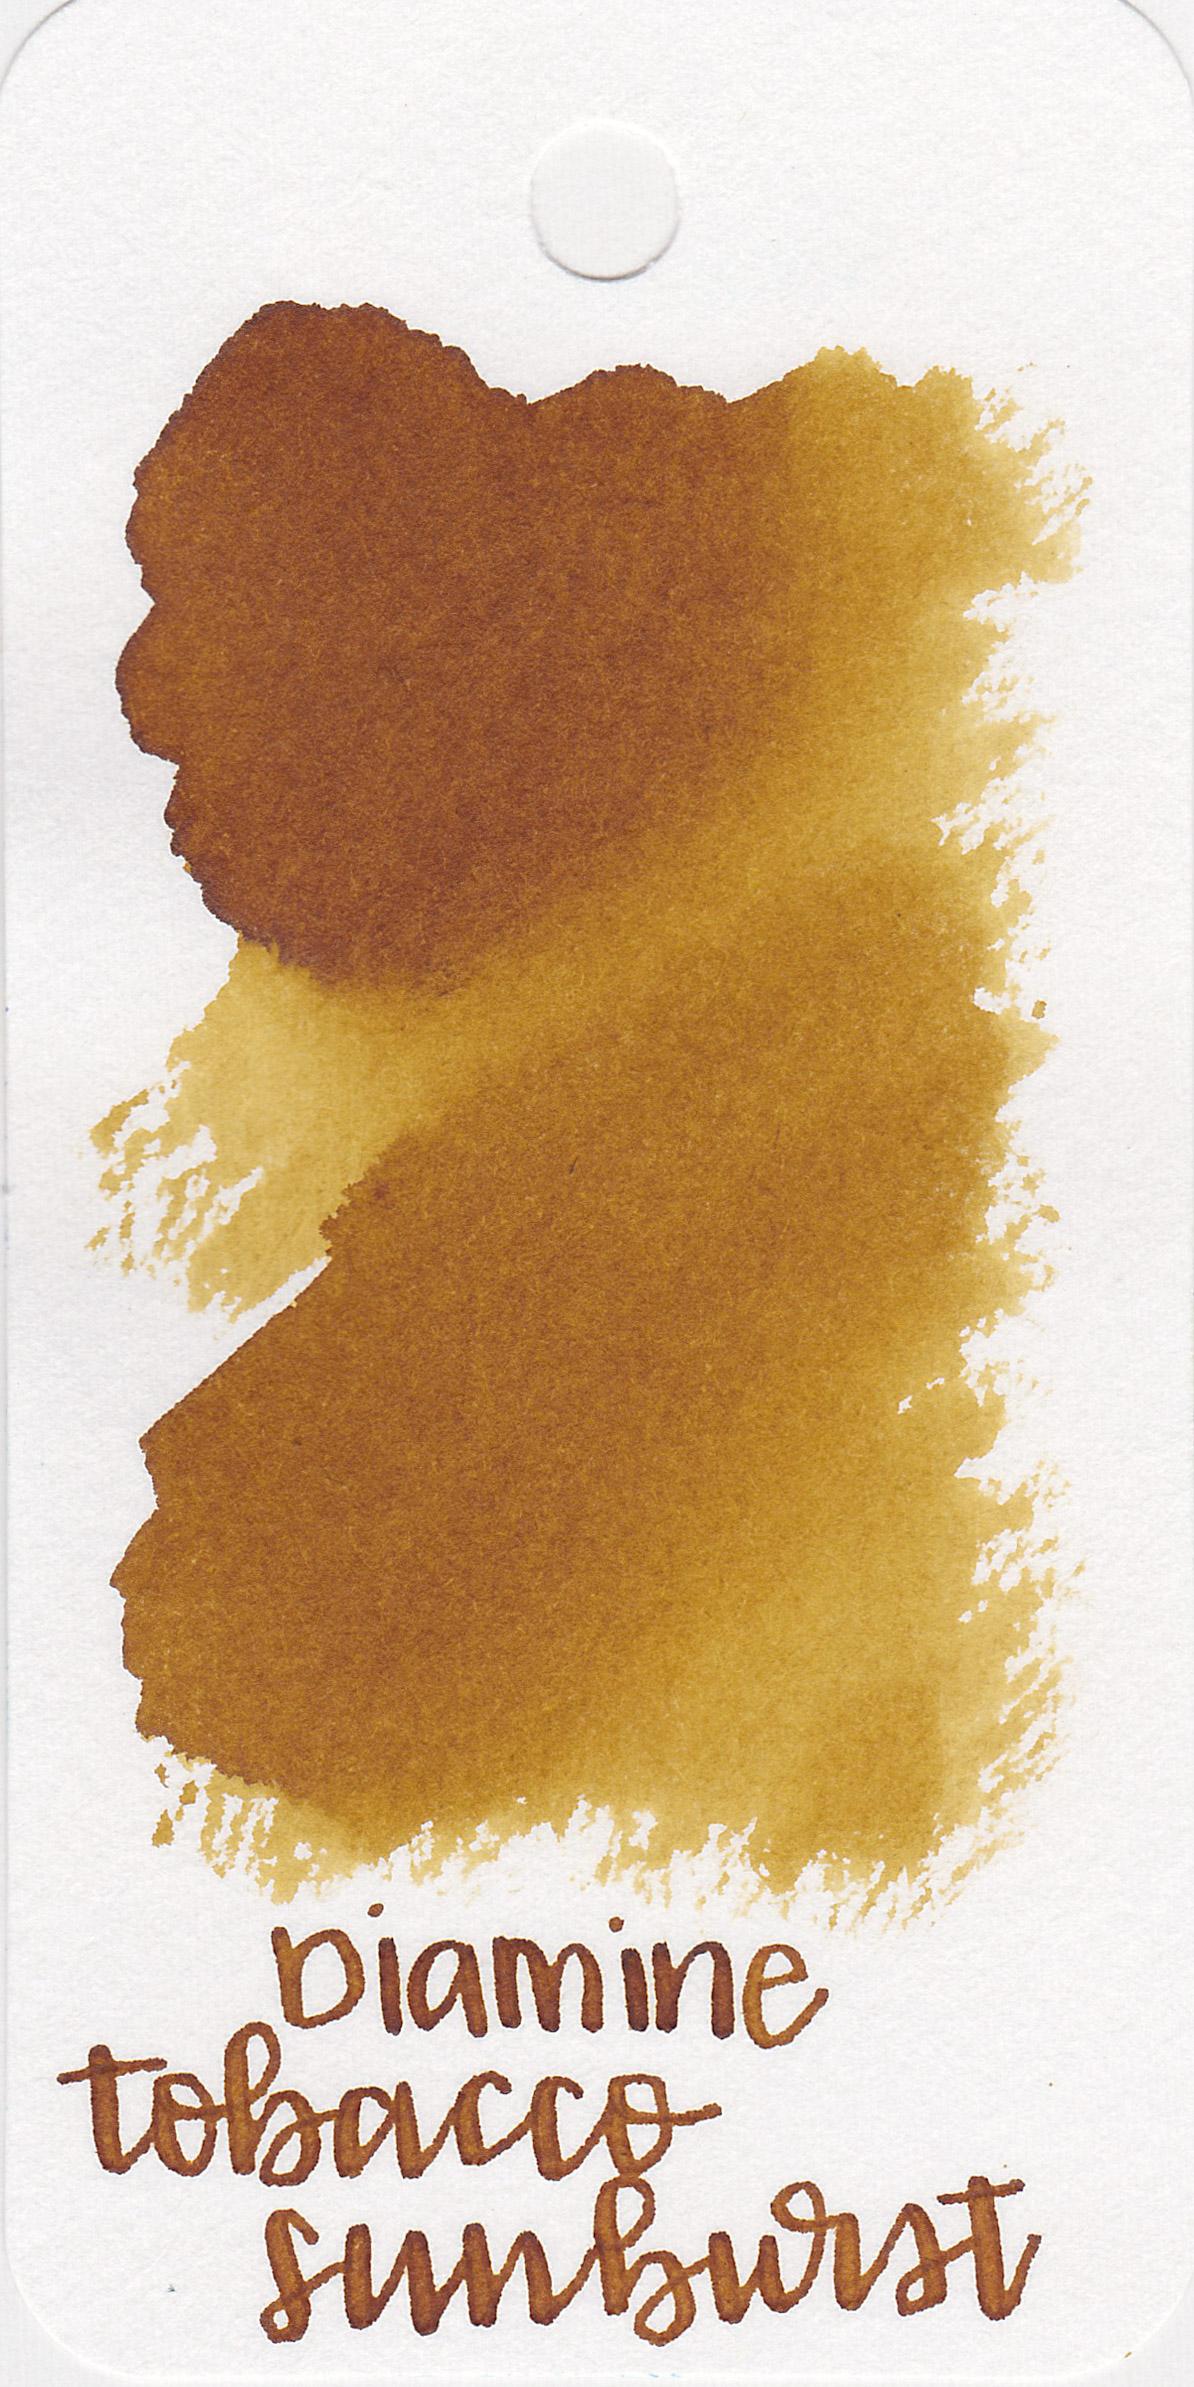 d-tobacco-sunburst-1.jpg